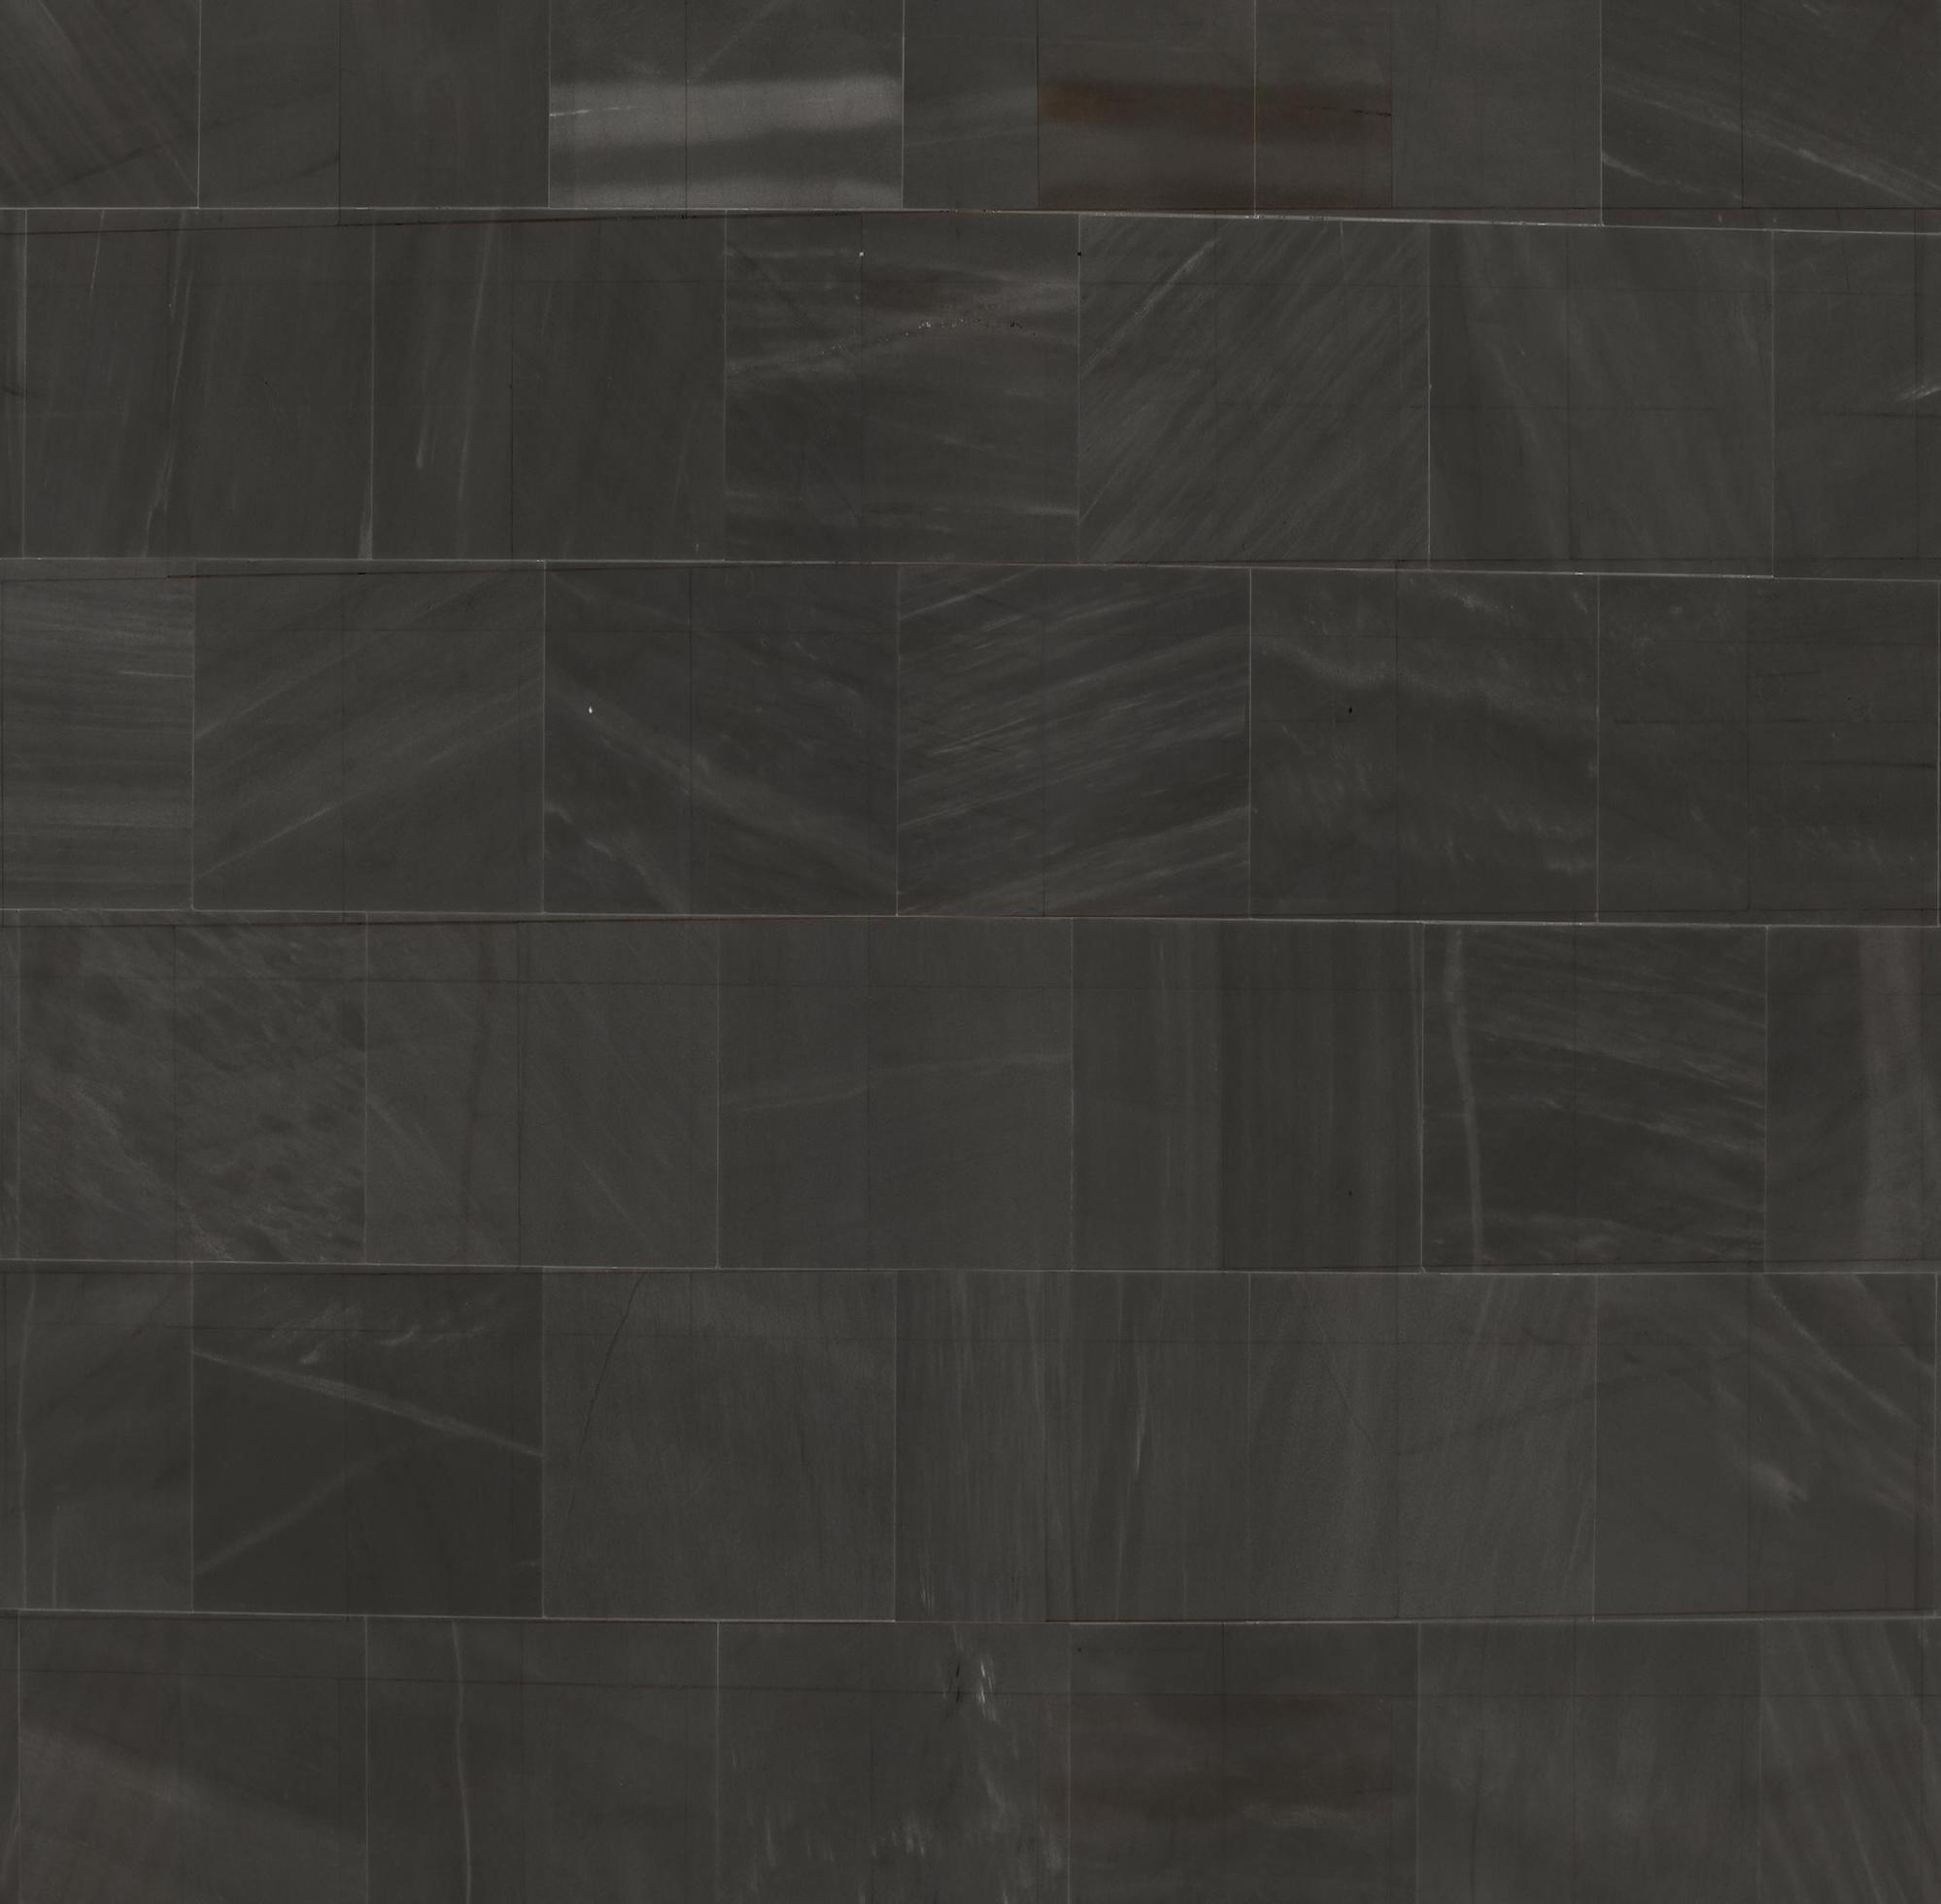 gray stone tile texture background